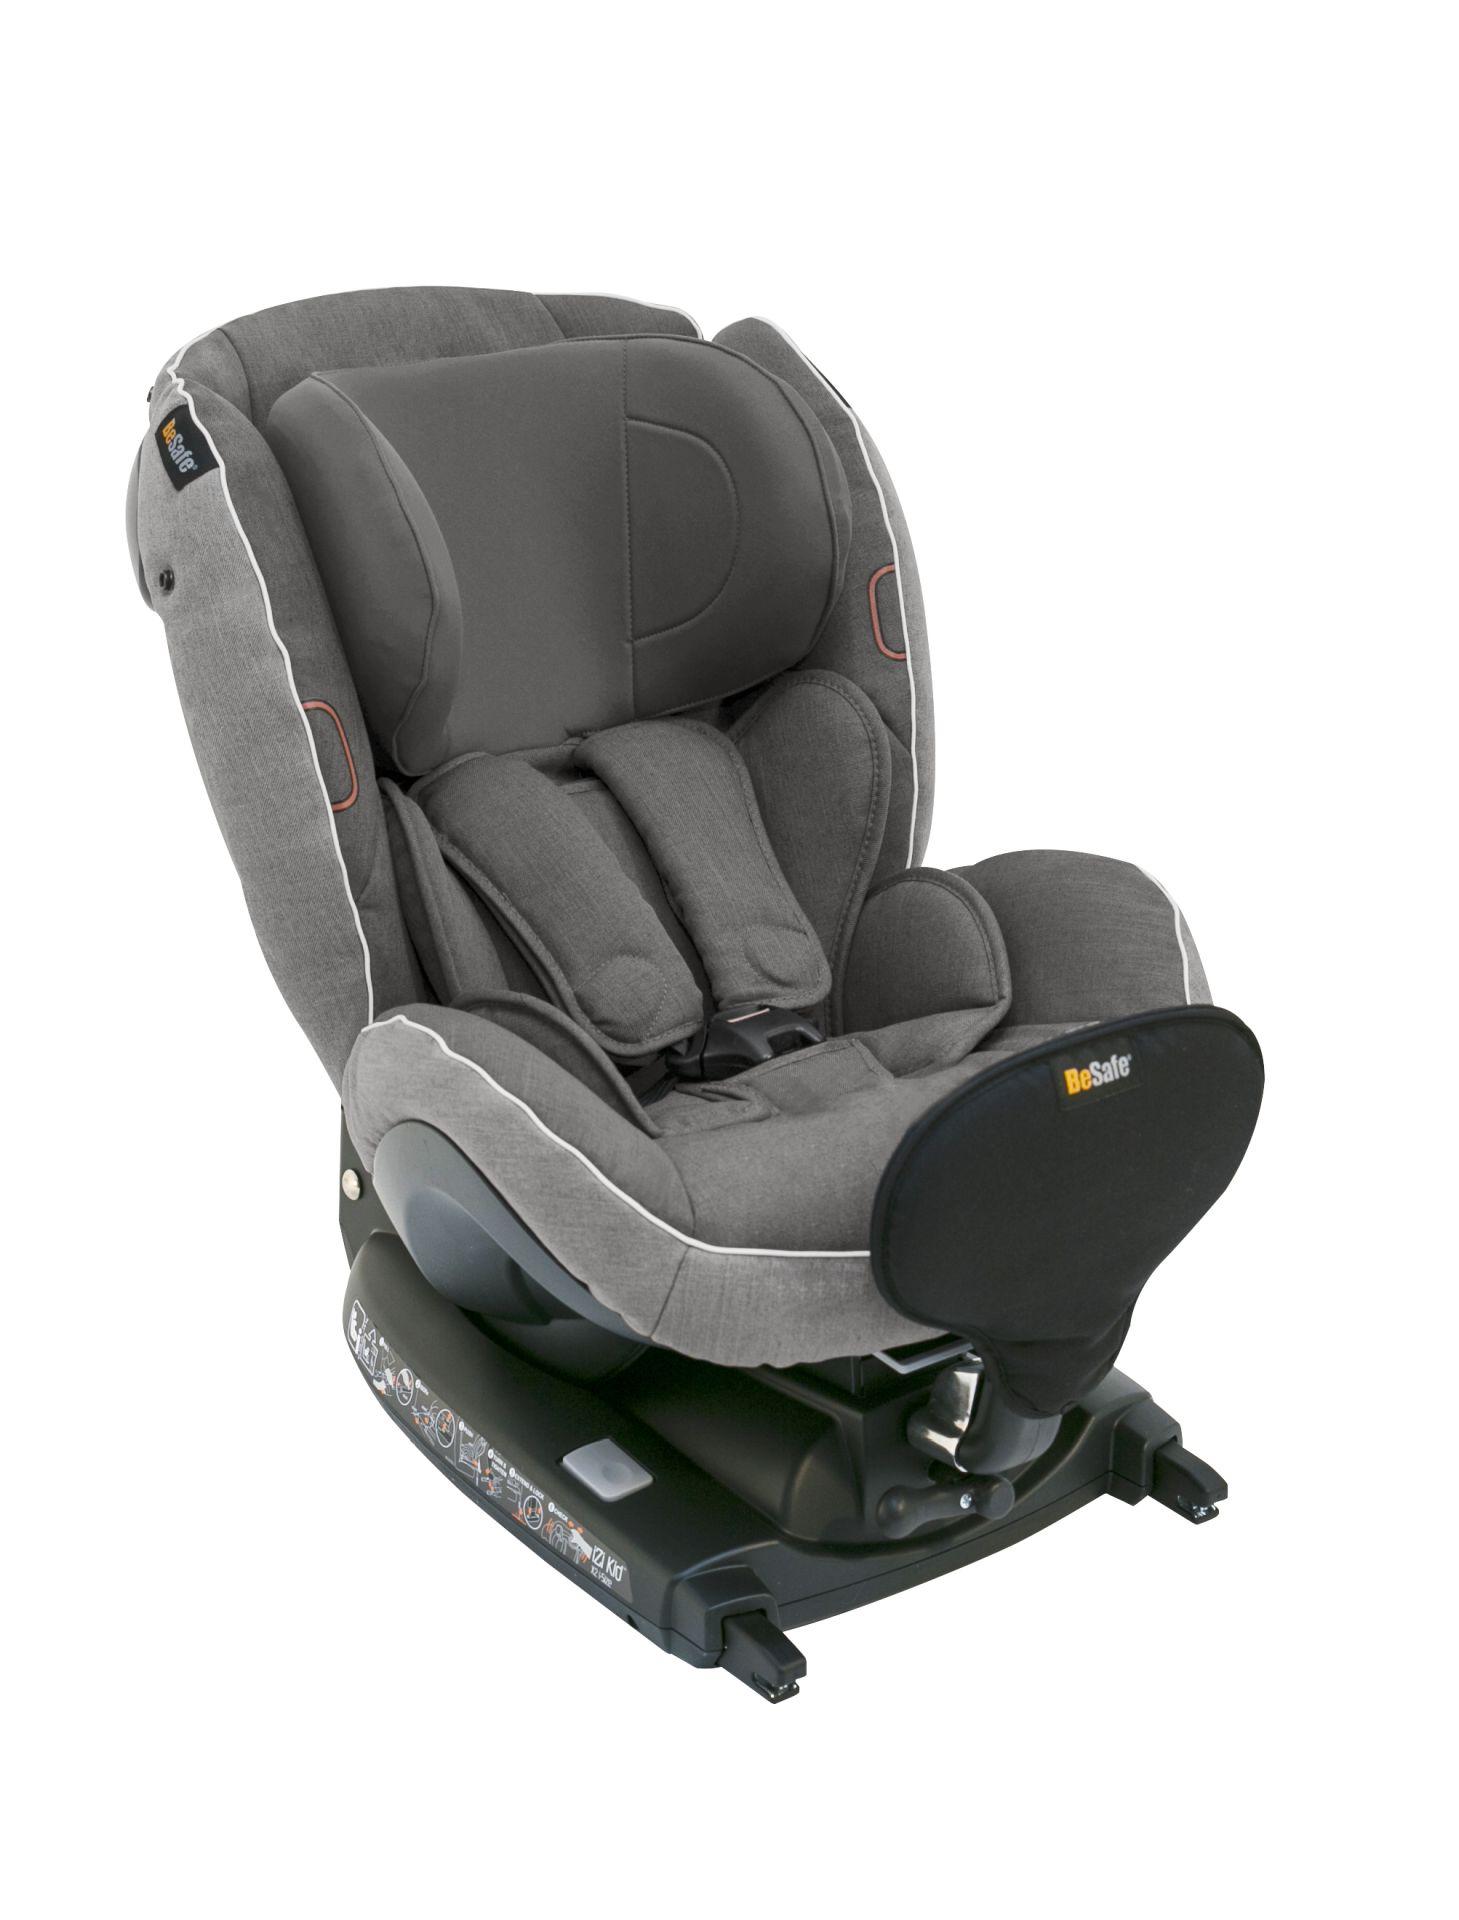 besafe child car seat izi kid x2 i size 2017 metallic melange buy at kidsroom car seats. Black Bedroom Furniture Sets. Home Design Ideas